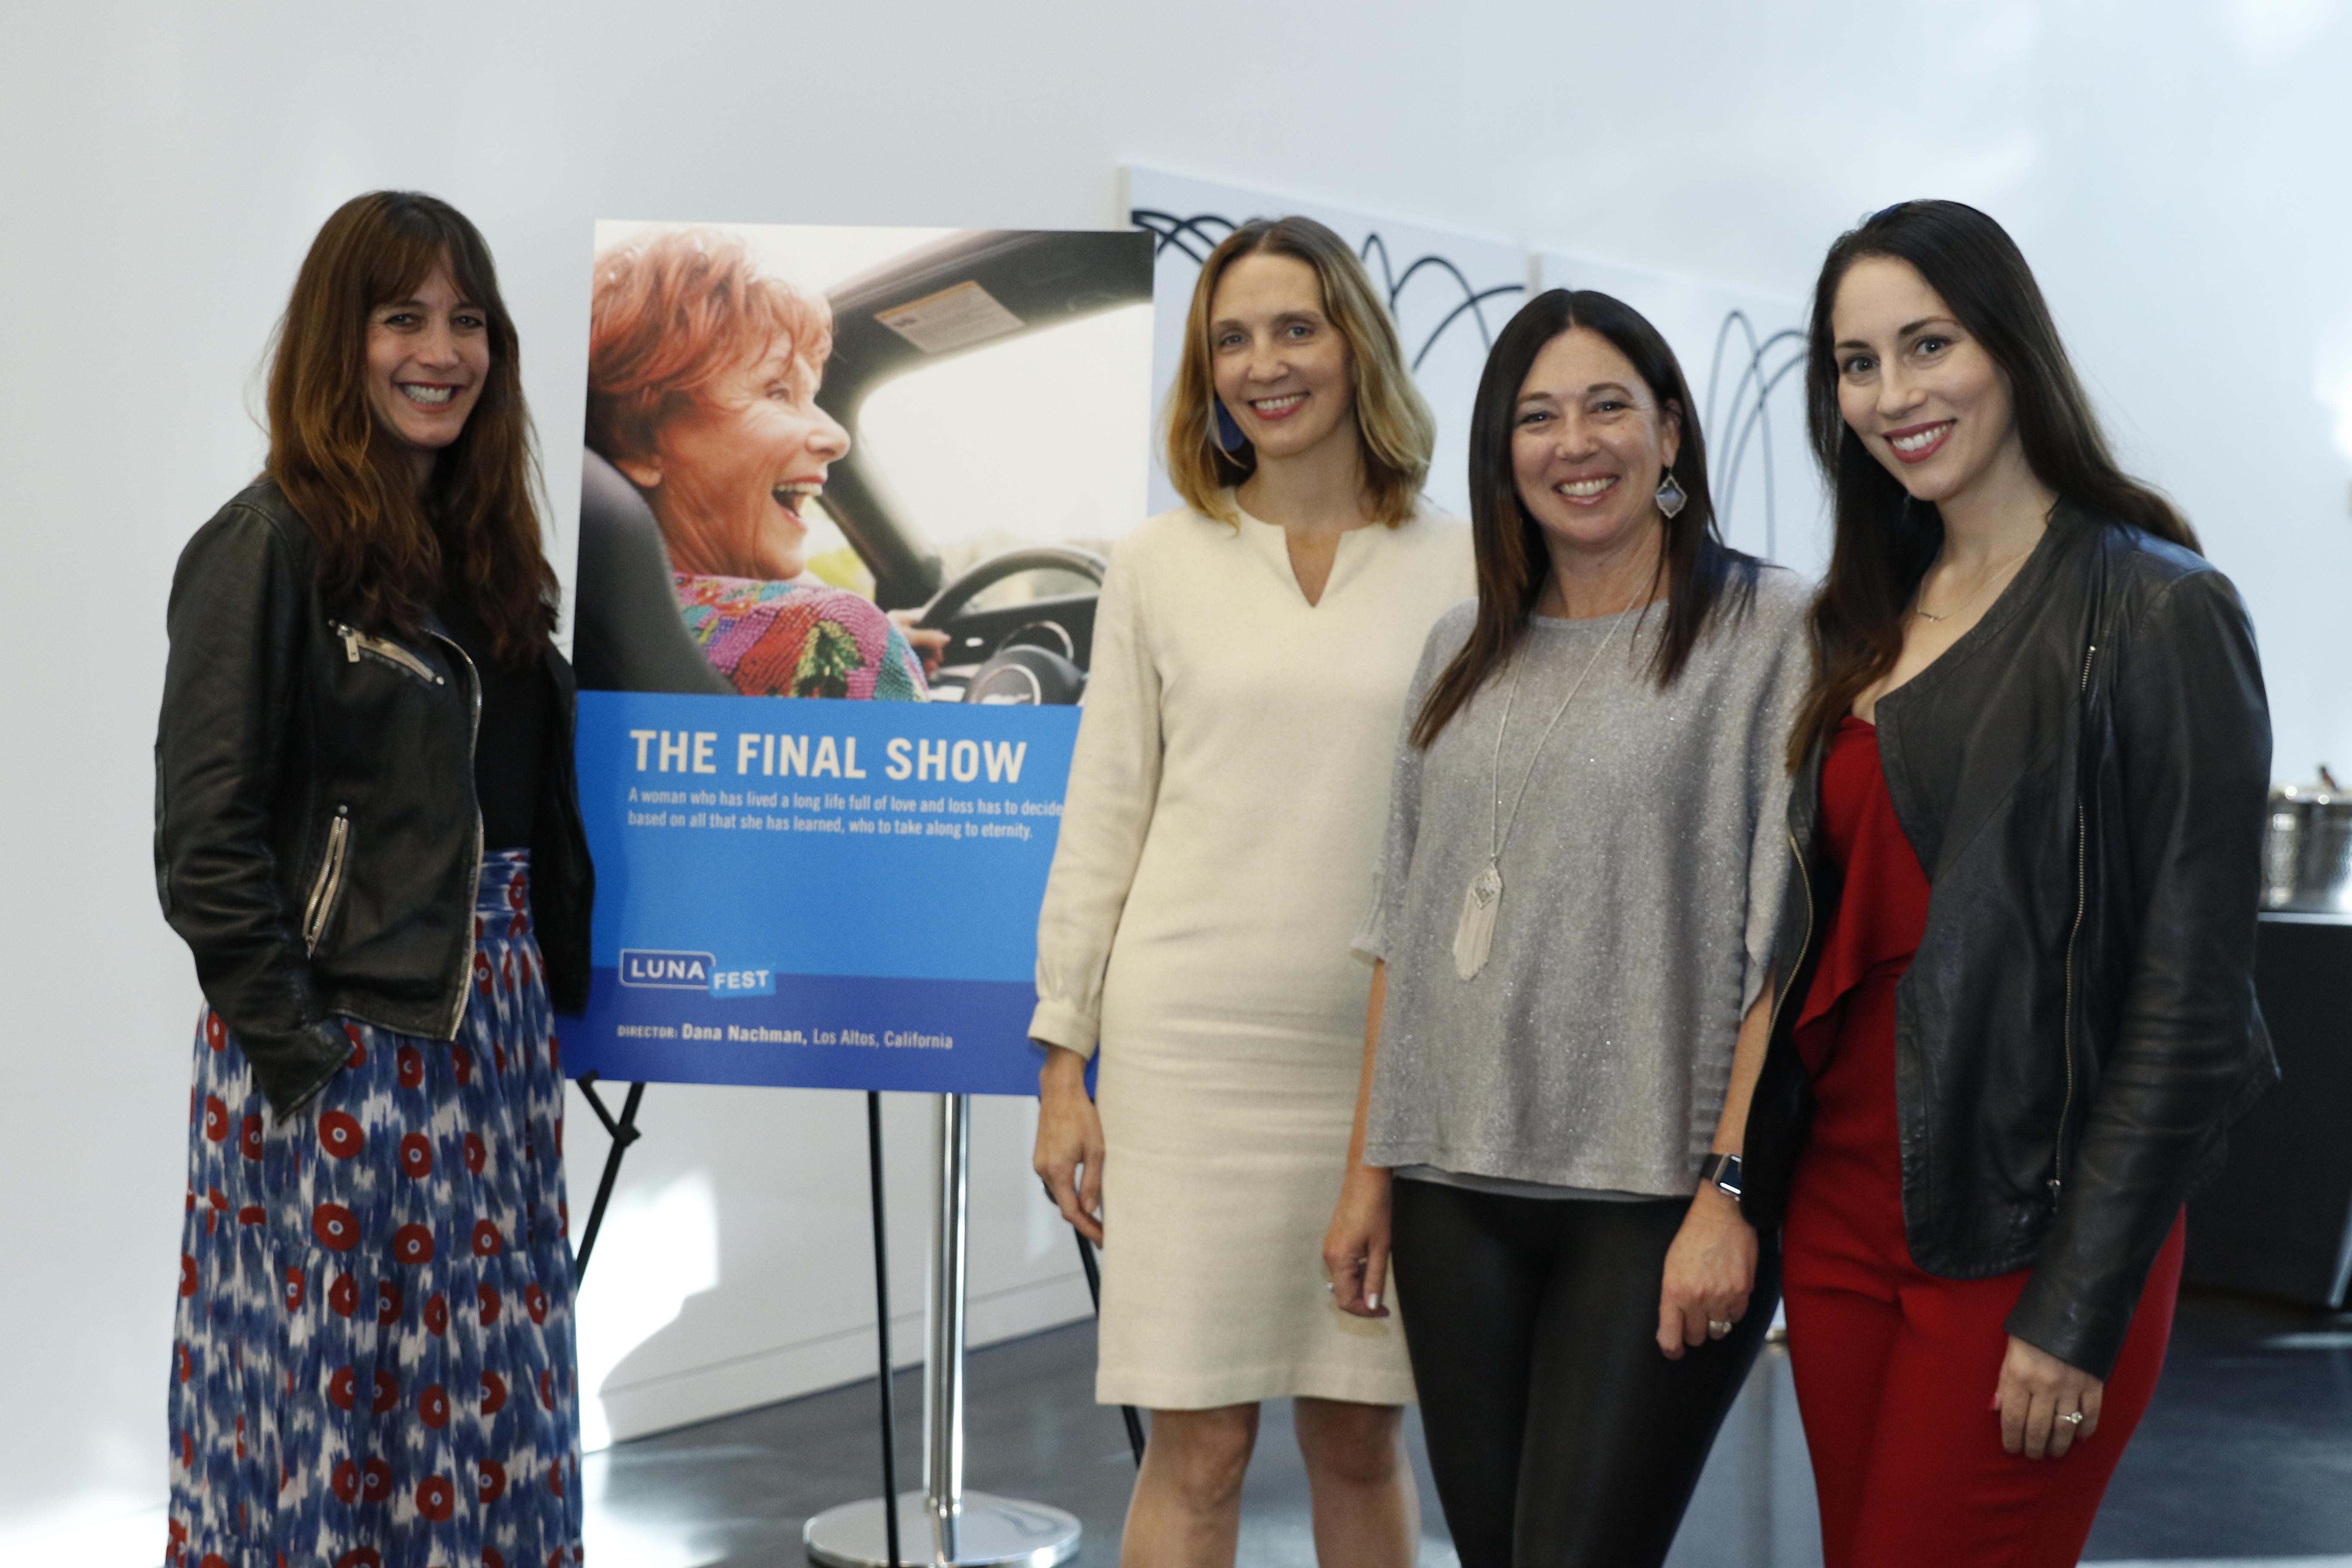 Dana Nachman, Amanda Heier, Jennifer Bowcock, and Lauren Goode at LUNAFEST